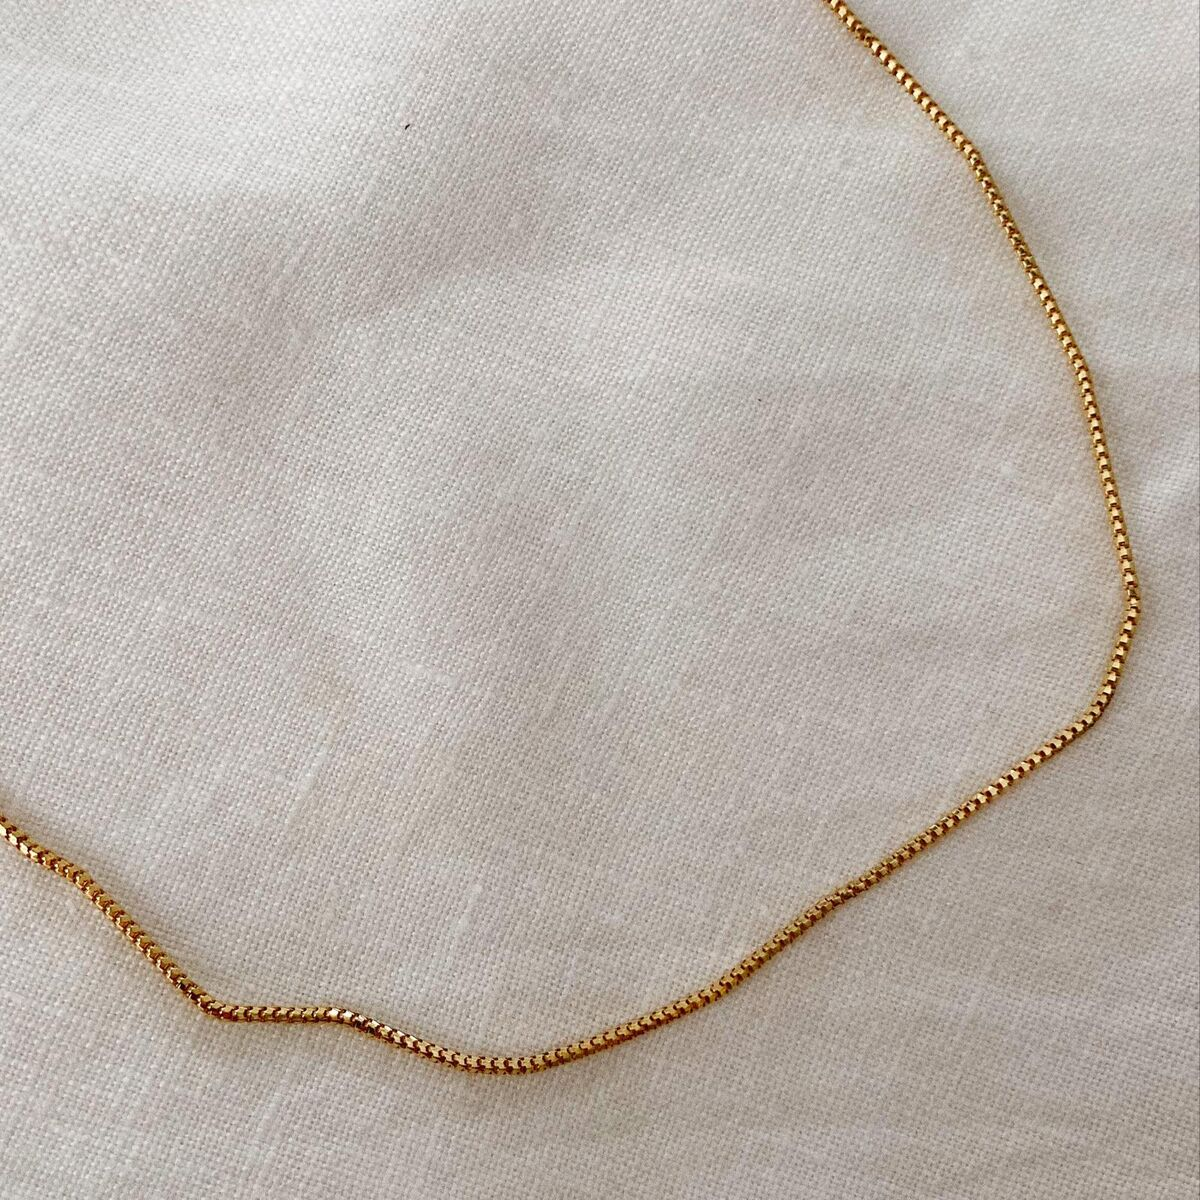 İnce Boru Zincir Kolye | 925 Gümüş